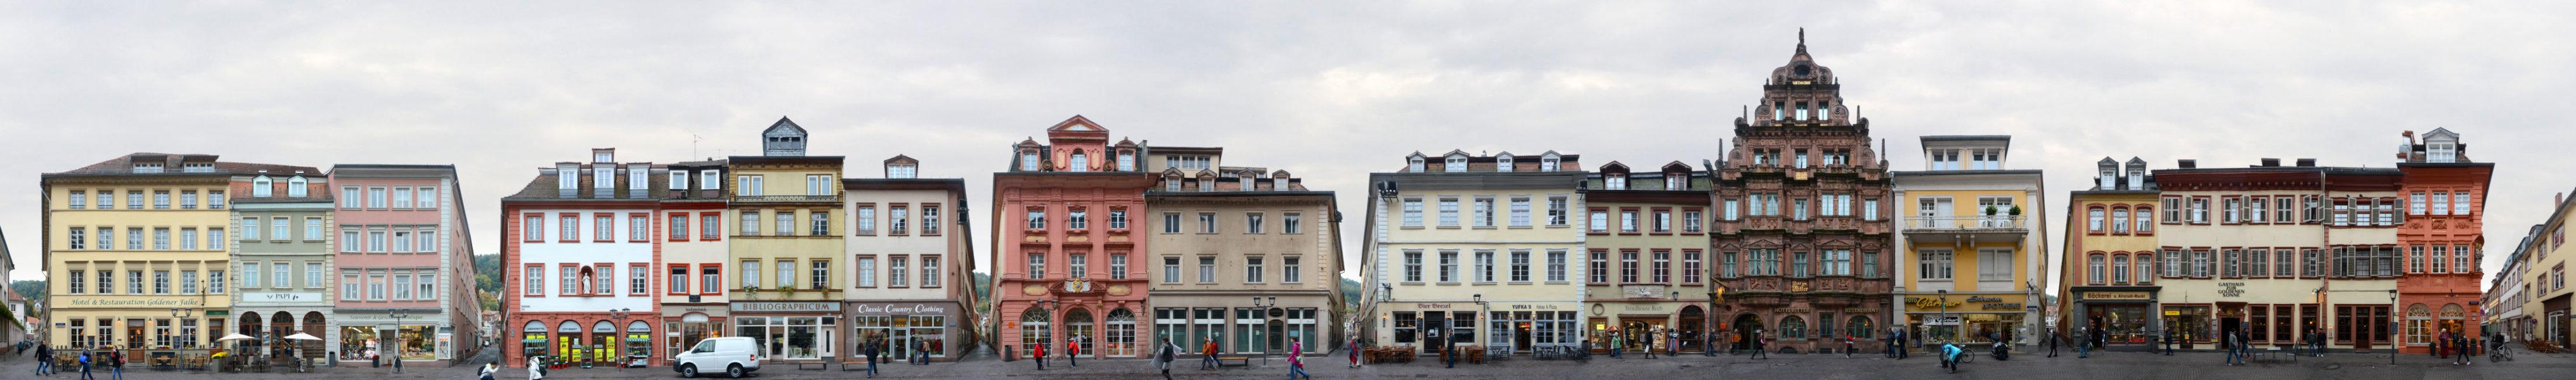 Hauptstraße | Haus zum Ritter